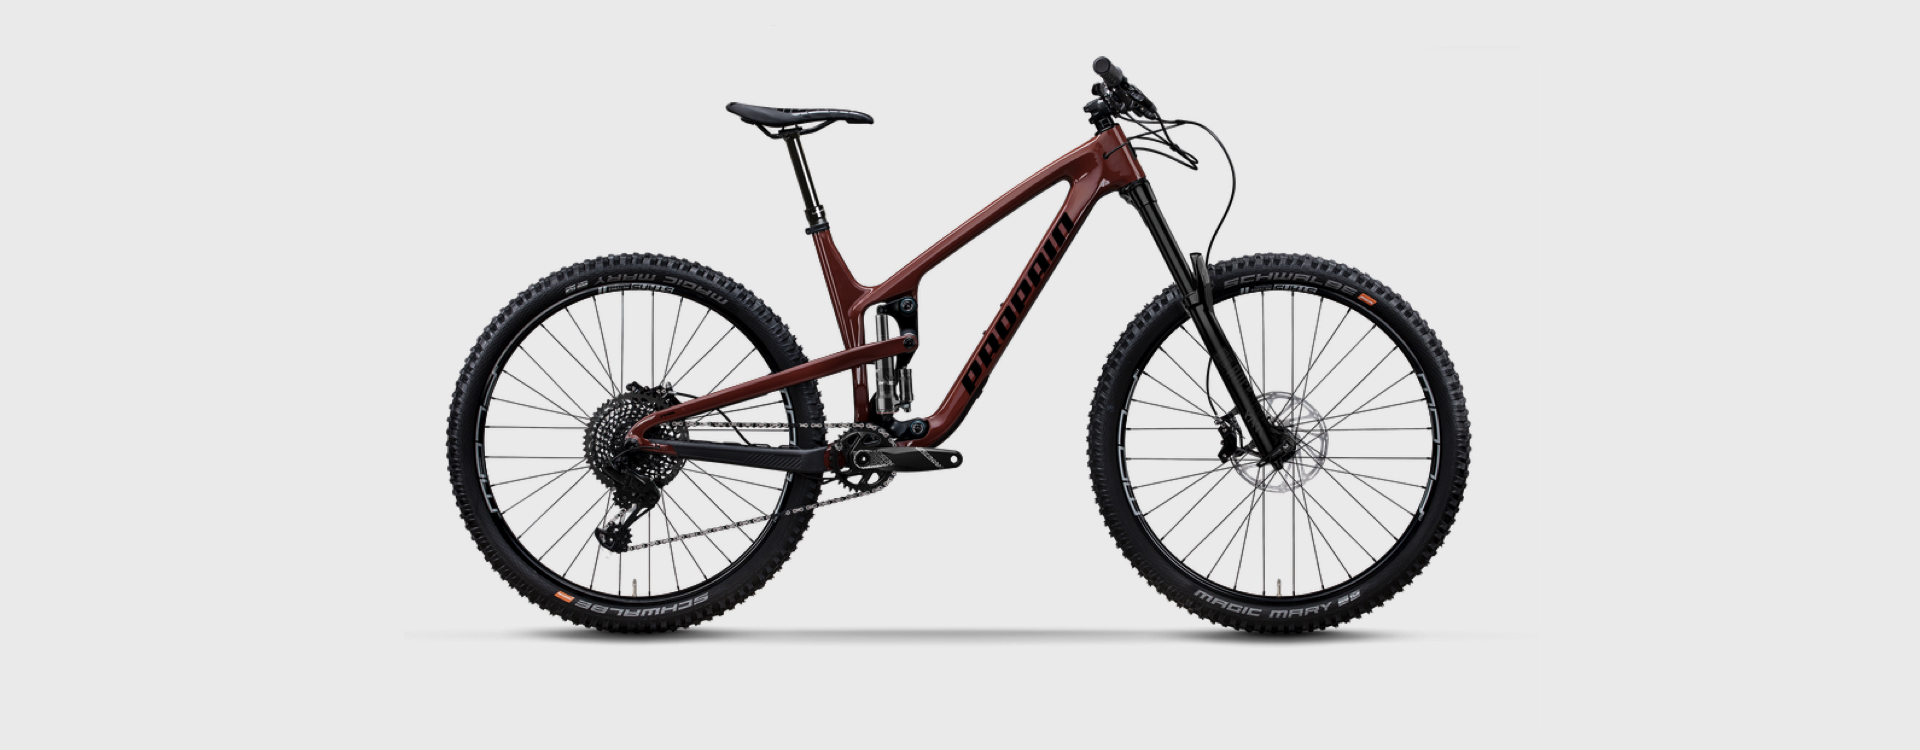 Bike Verleih Gummersbach Propain Bikes Testcenter NRW Tyee 1 - CF - S - 650B - Marsred - 1920x750